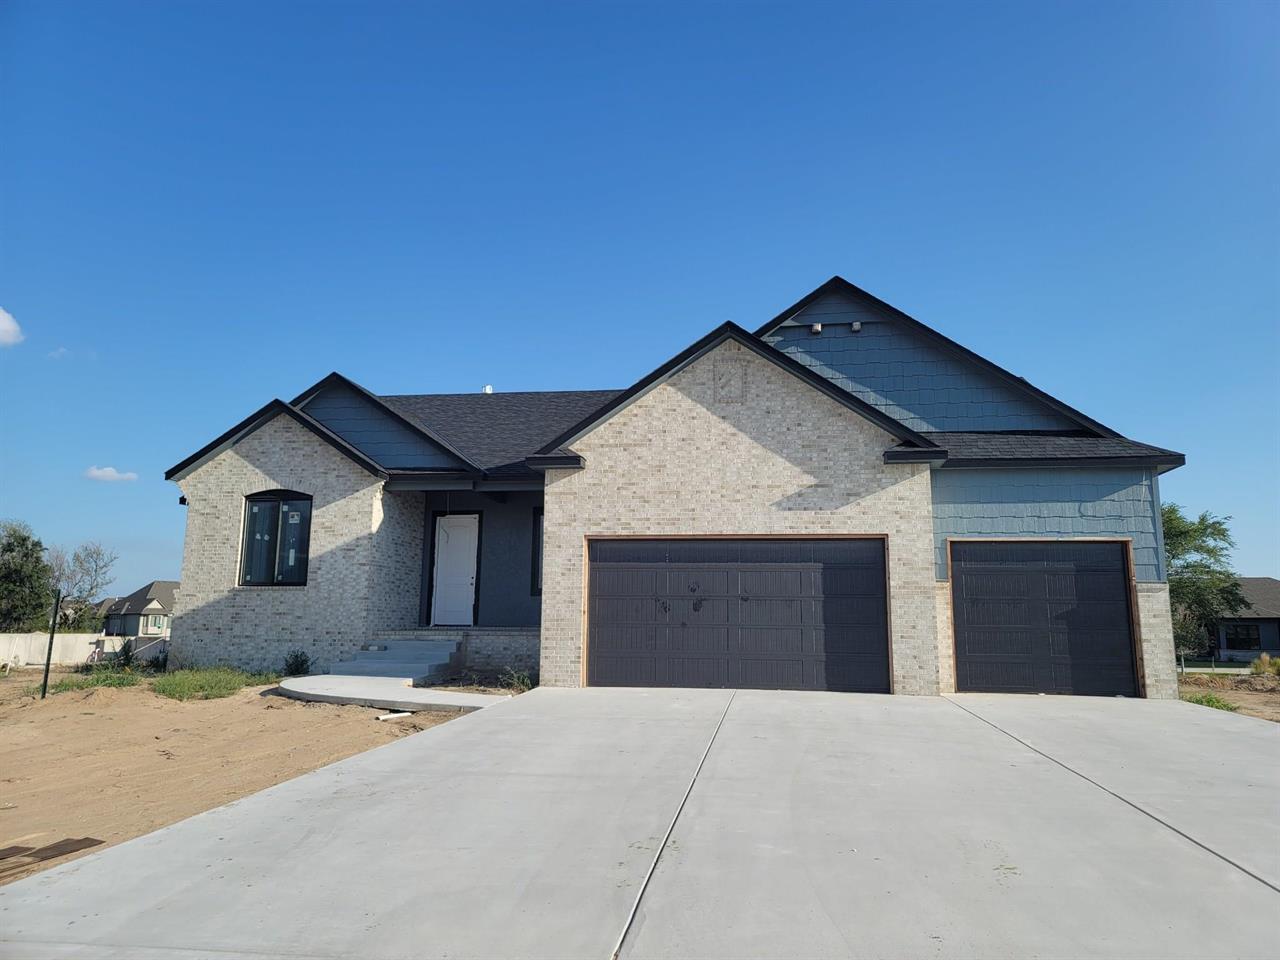 For Sale: 4911 W 26th Ct N, Wichita, KS 67205,